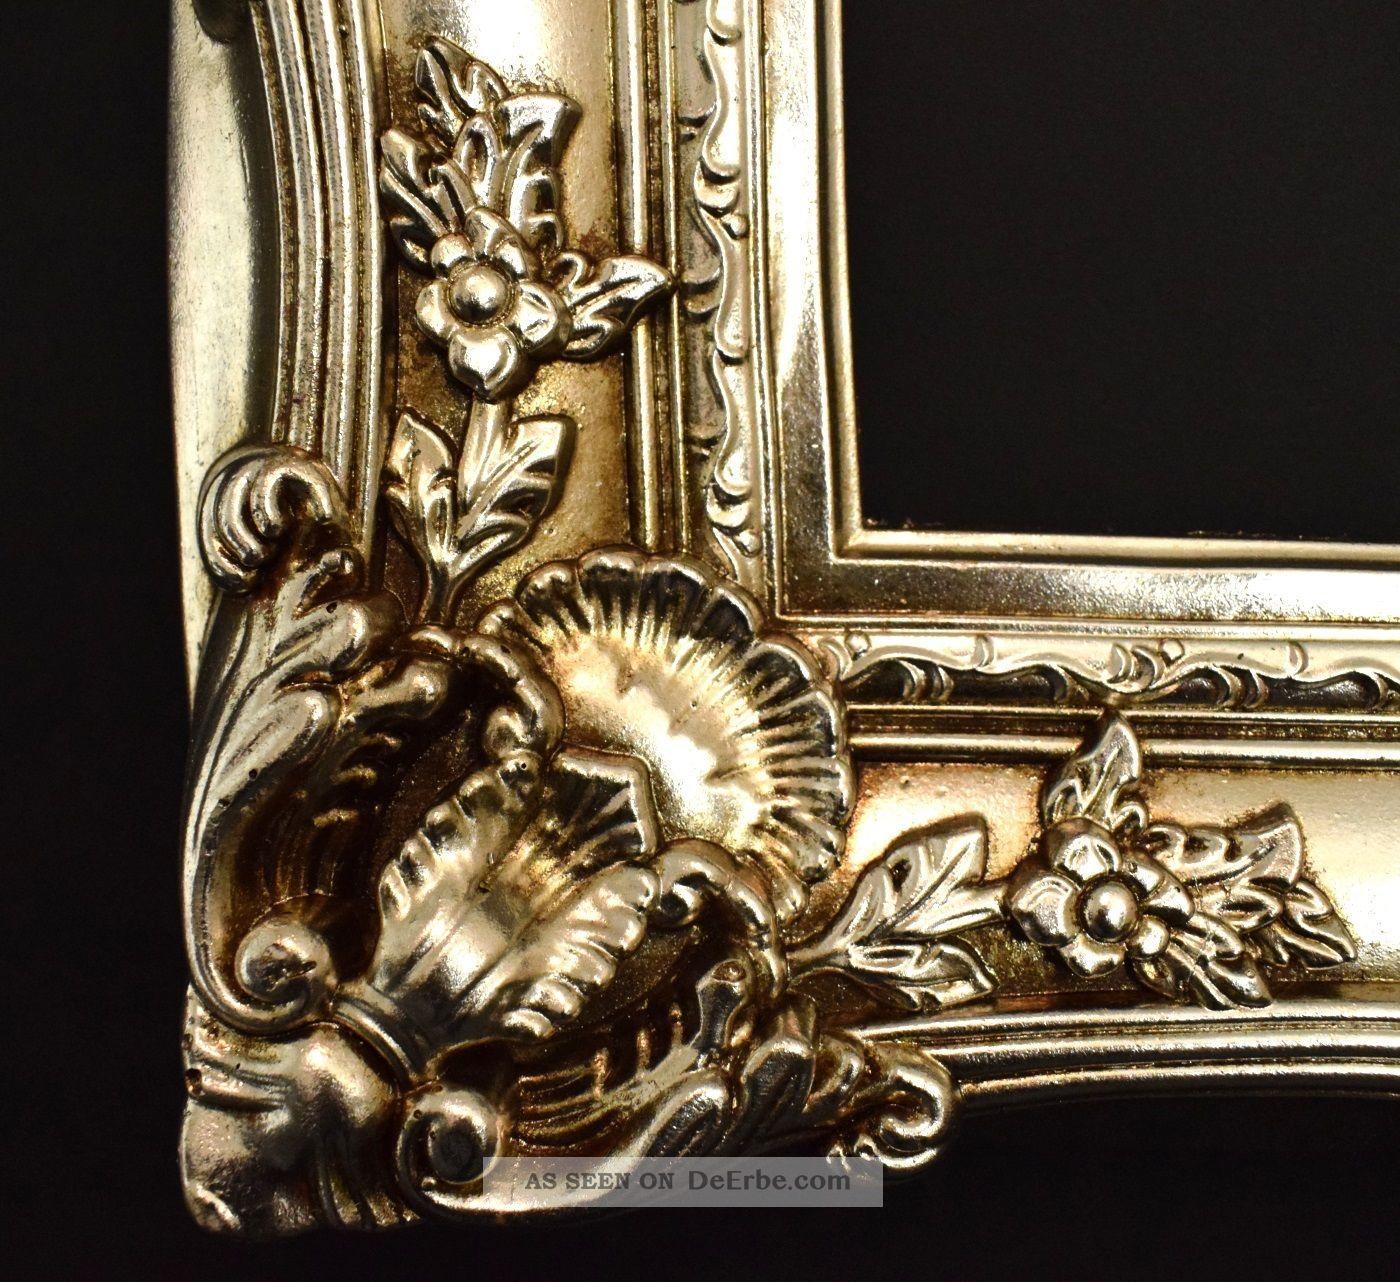 bilderrahmen barock rokoko stil 40 x 50 cm 60x70 cm silber vintage barockrahmen. Black Bedroom Furniture Sets. Home Design Ideas